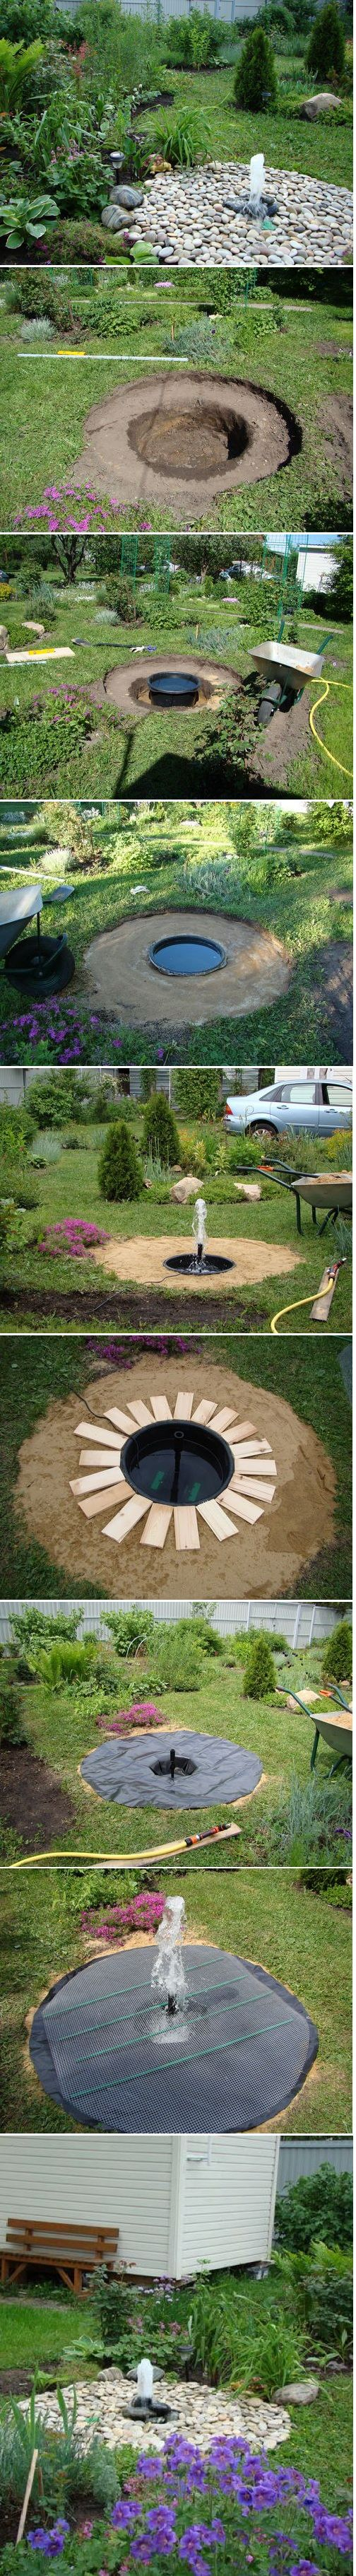 Backyard-Pond-4